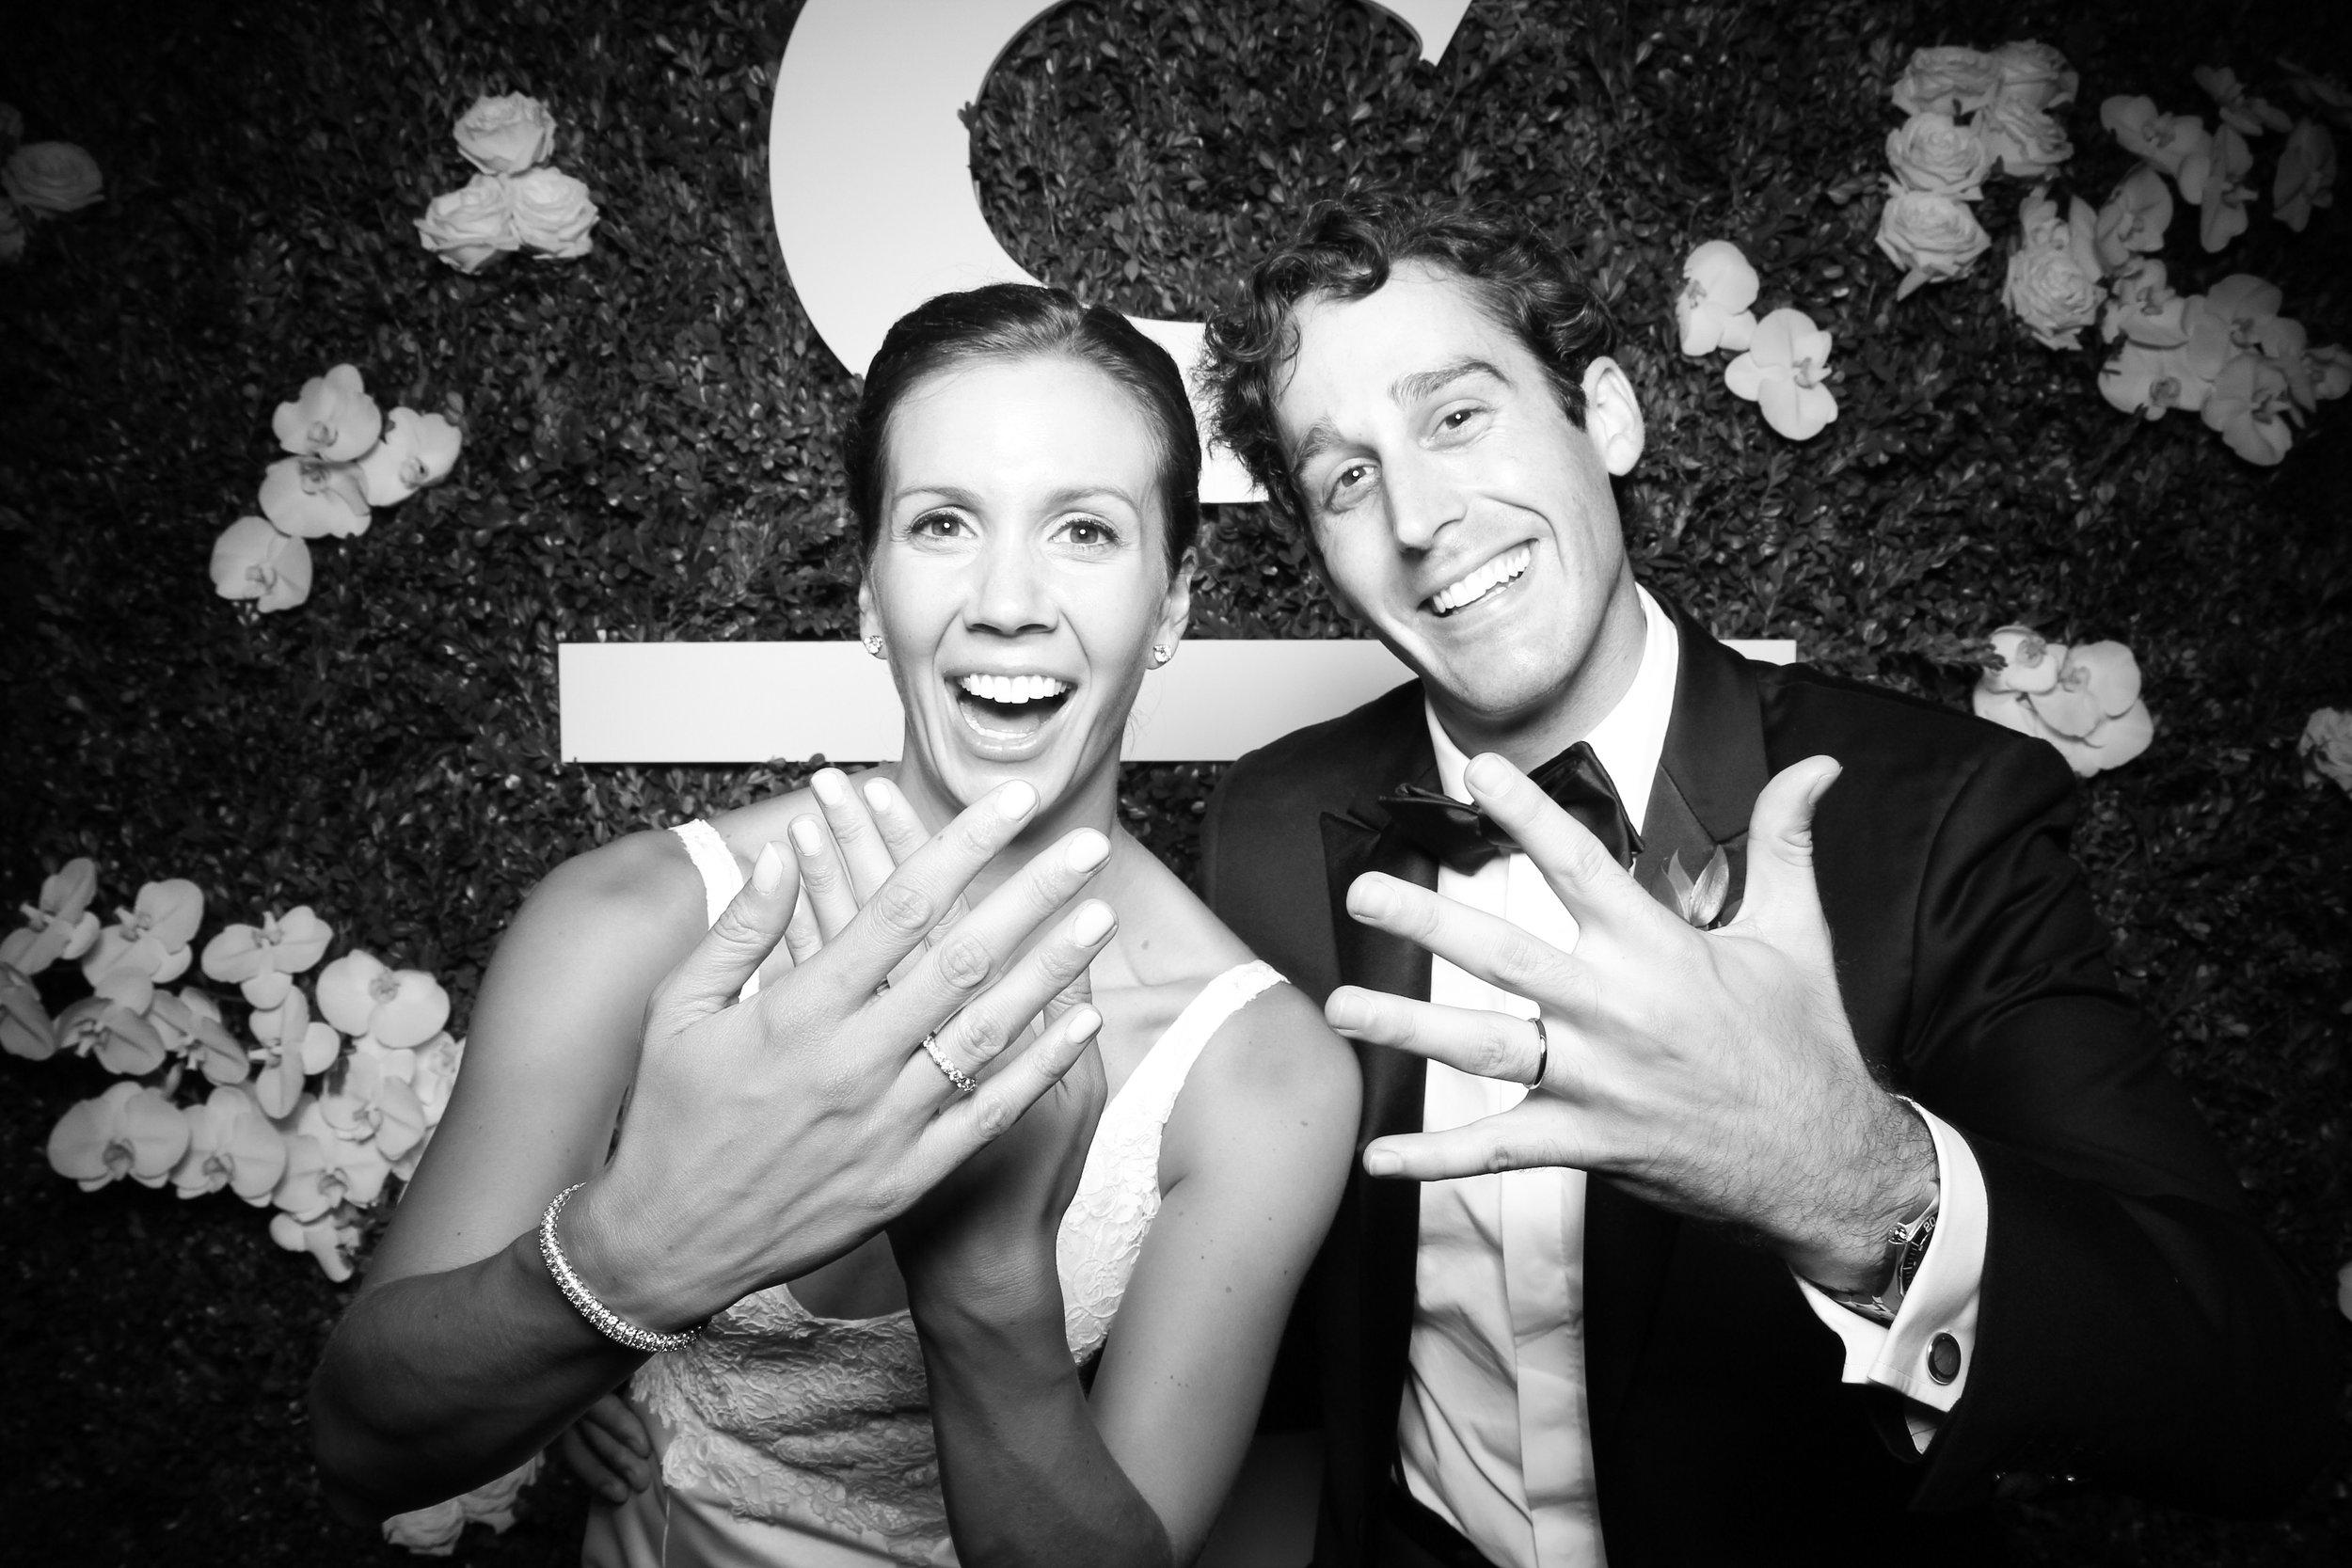 Peninsula_Hotel_Chicago_Wedding_Photo_Booth_16.jpg